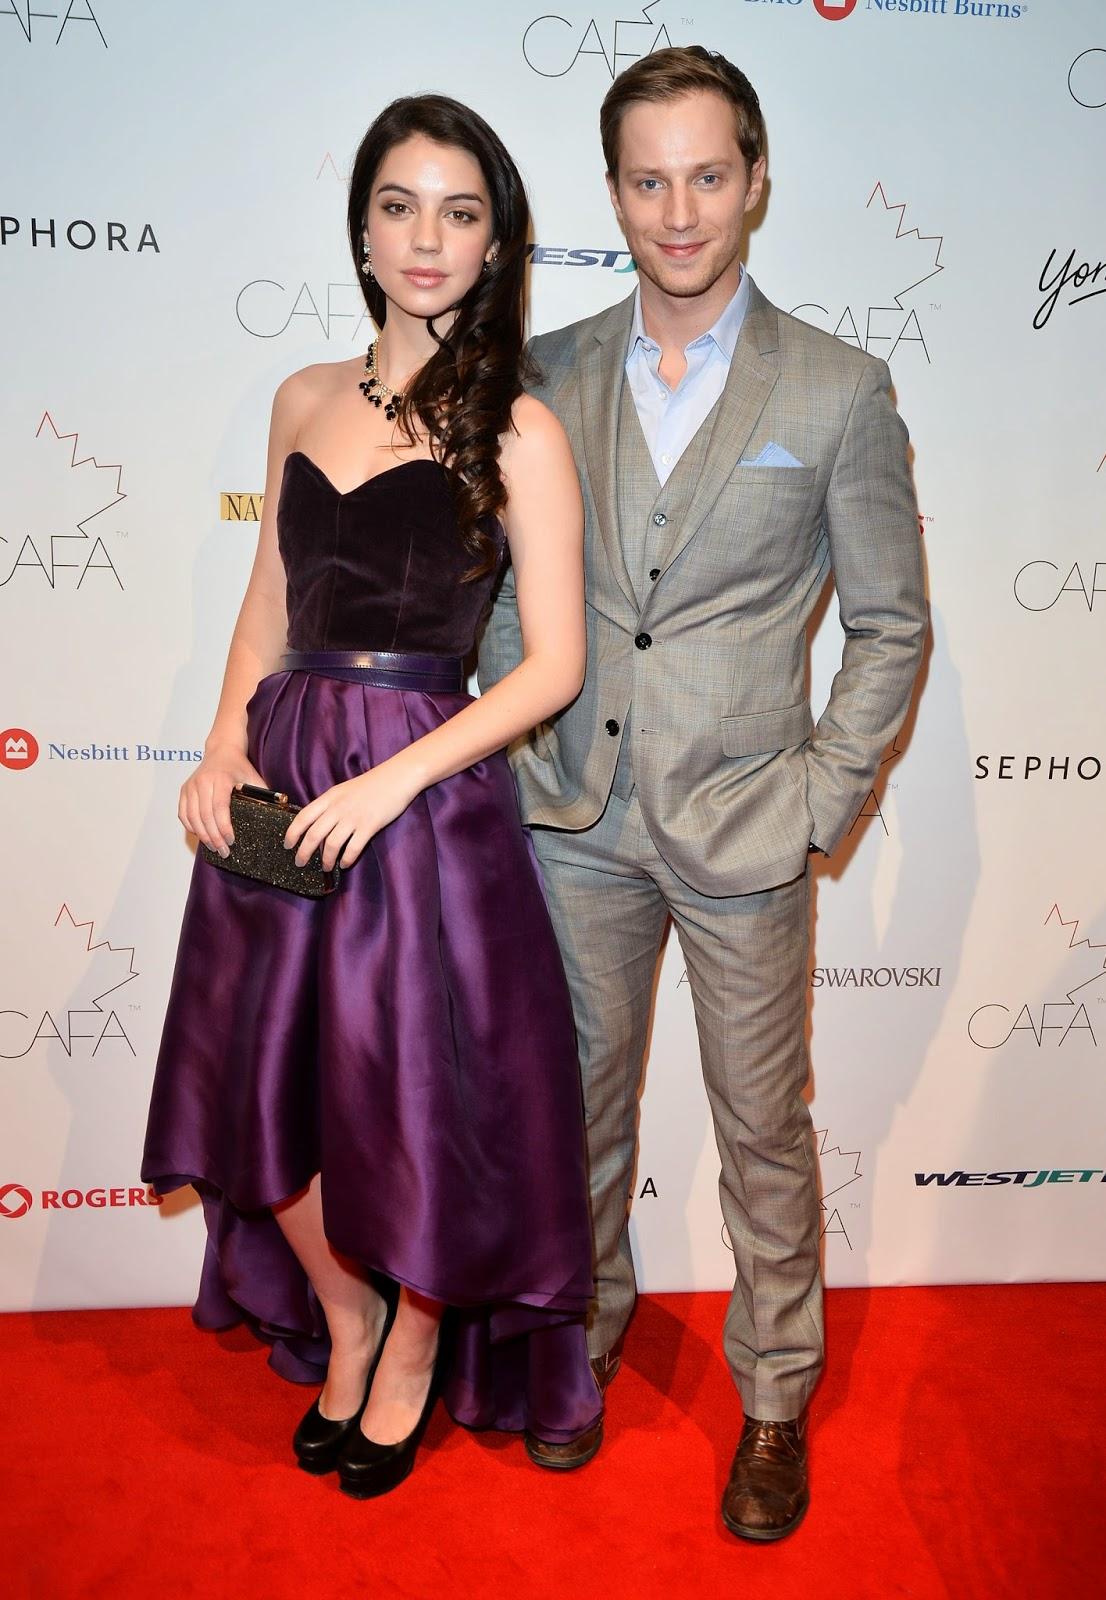 cafa, canadian arts ans fashion awards, adelaide kane, red carpet, teen wolf, reign